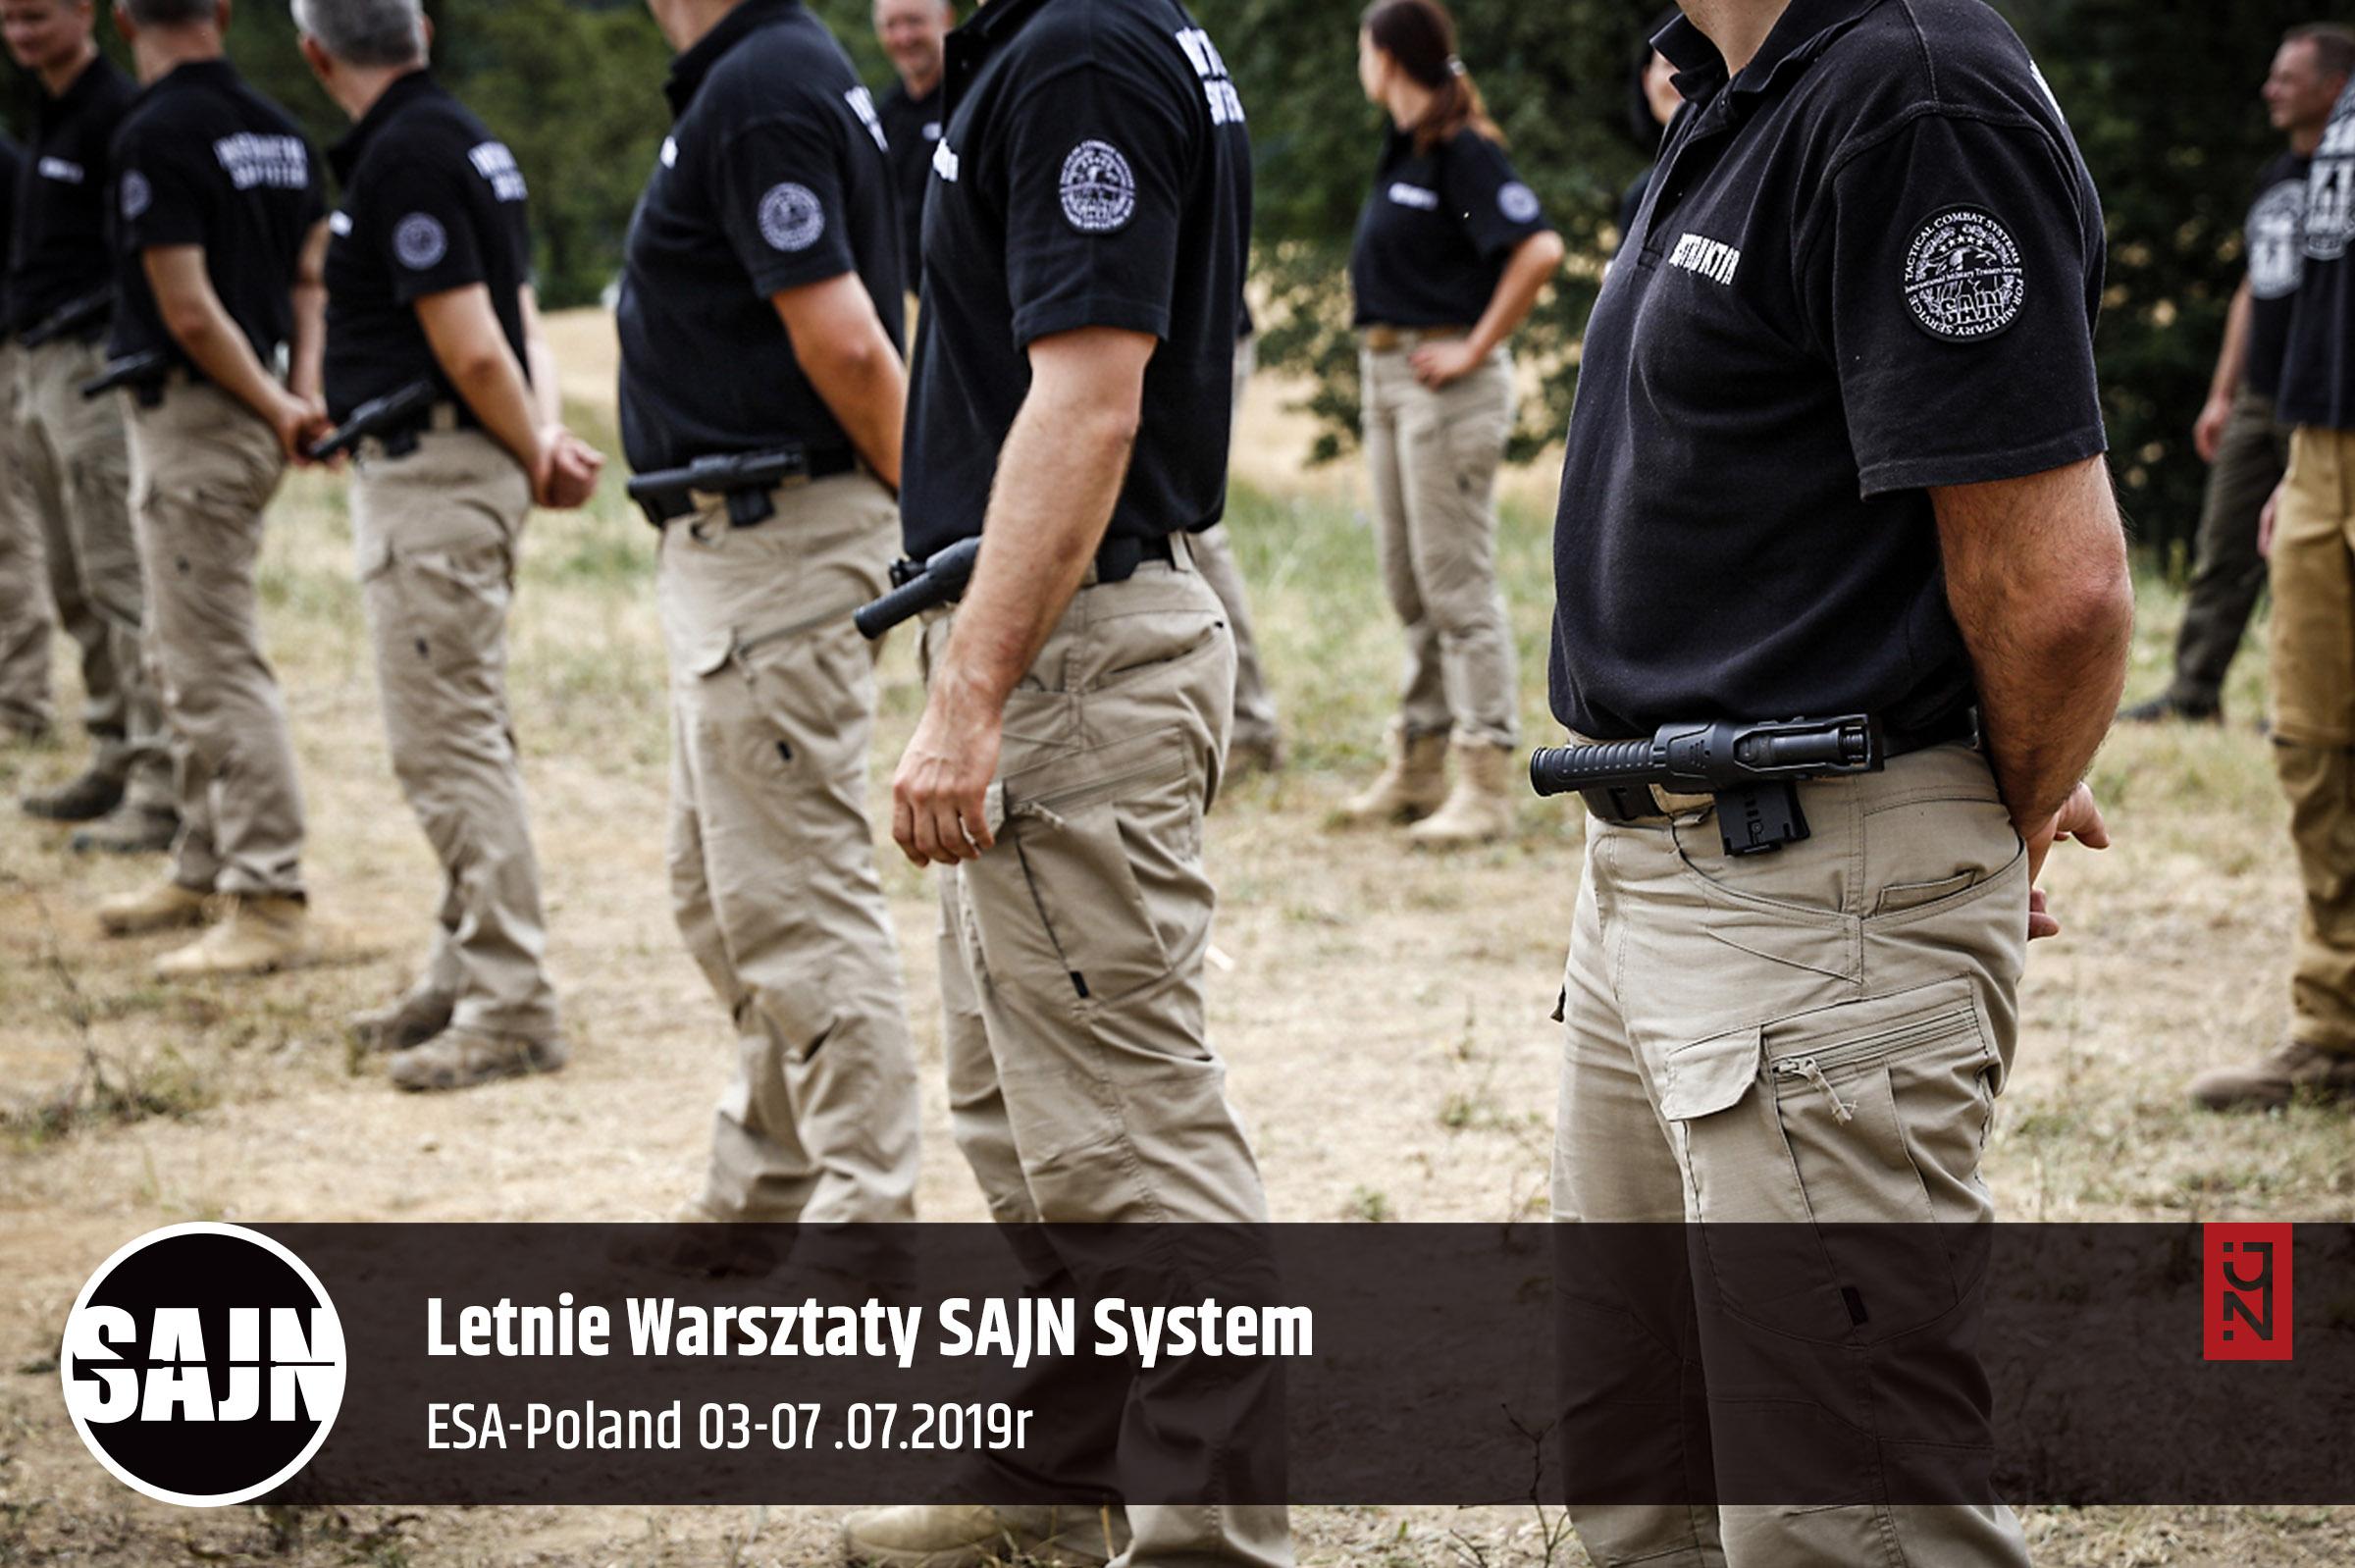 jan nycek_sajn_szkolenie sluzb mundurowych_palka teleskopowa_noz_samoobrona_dosan_3.jpg